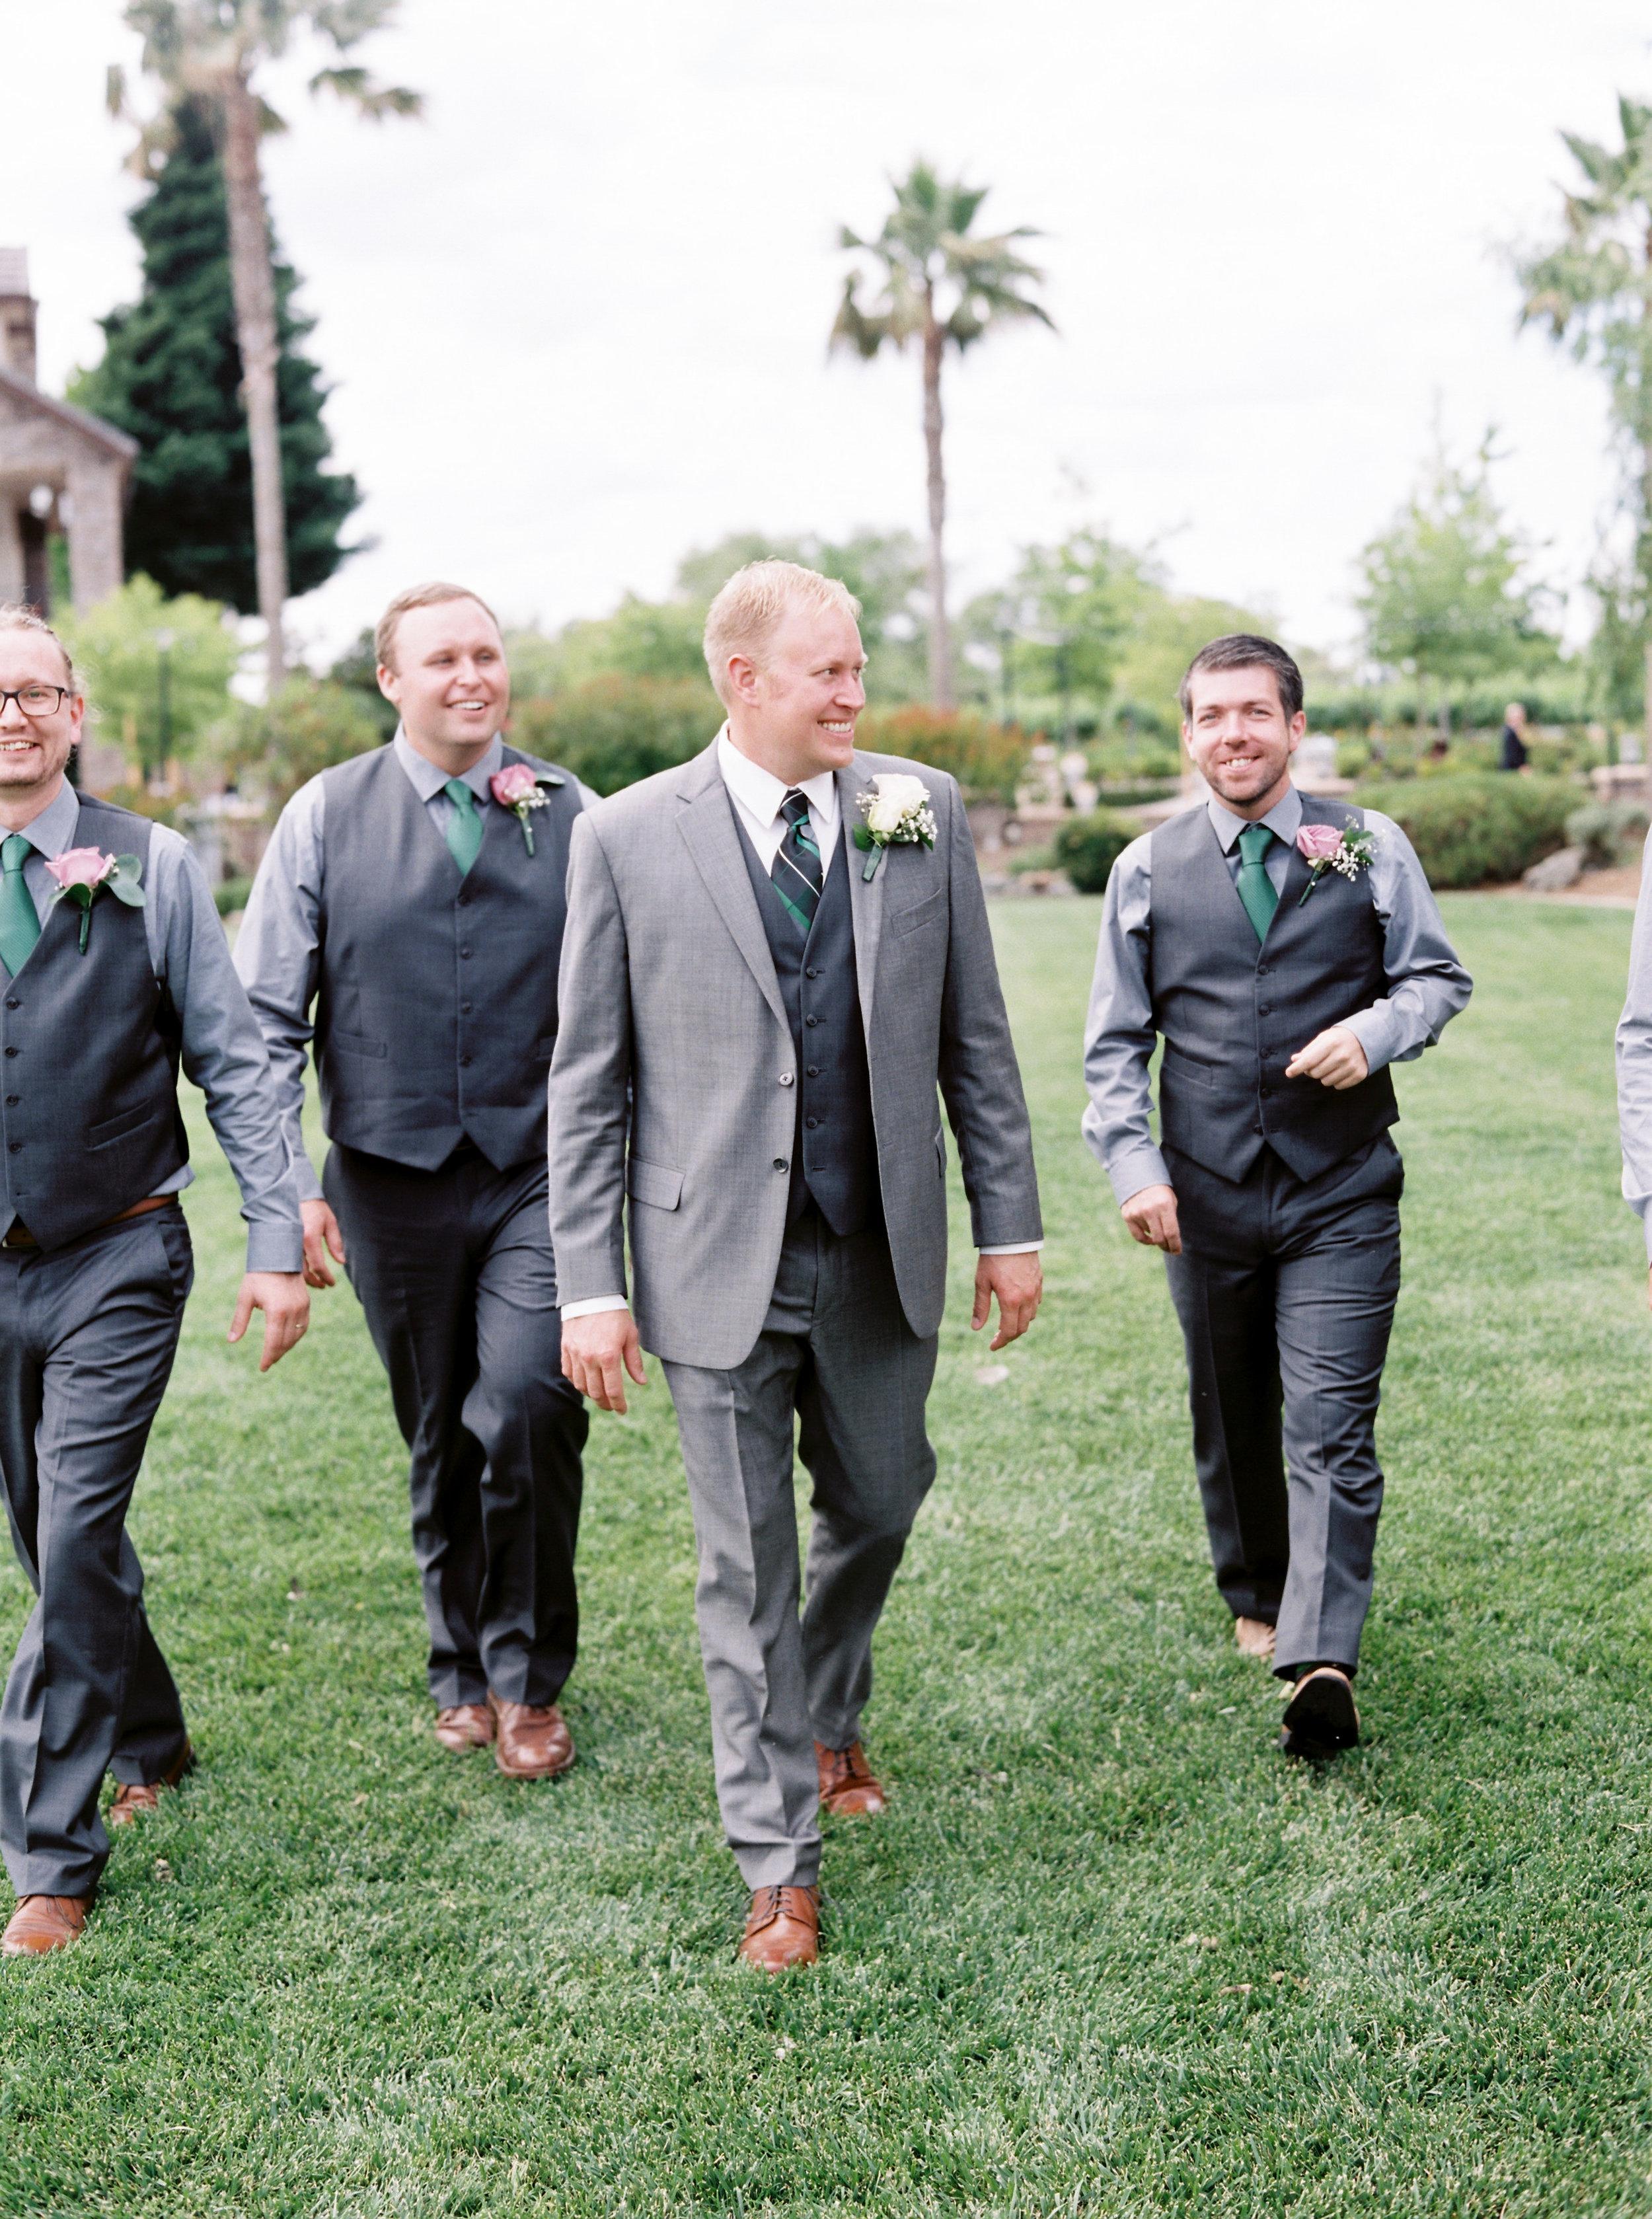 wolfe-heights-event-center-wedding-sacramento-california-wedding-51.jpg